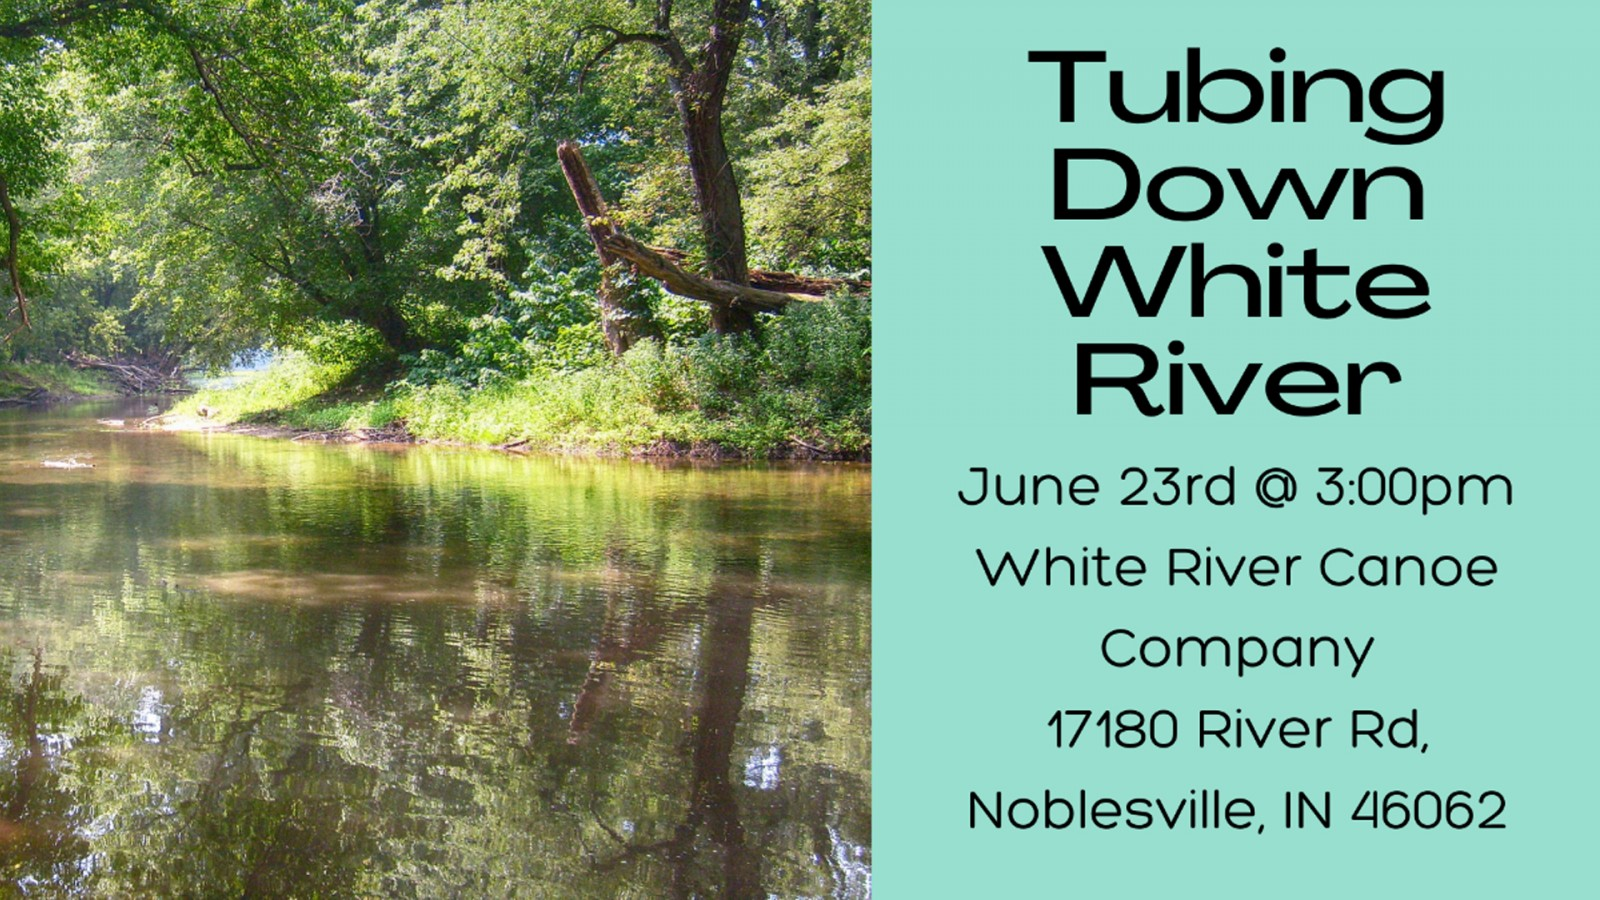 Tubing down the white river slide